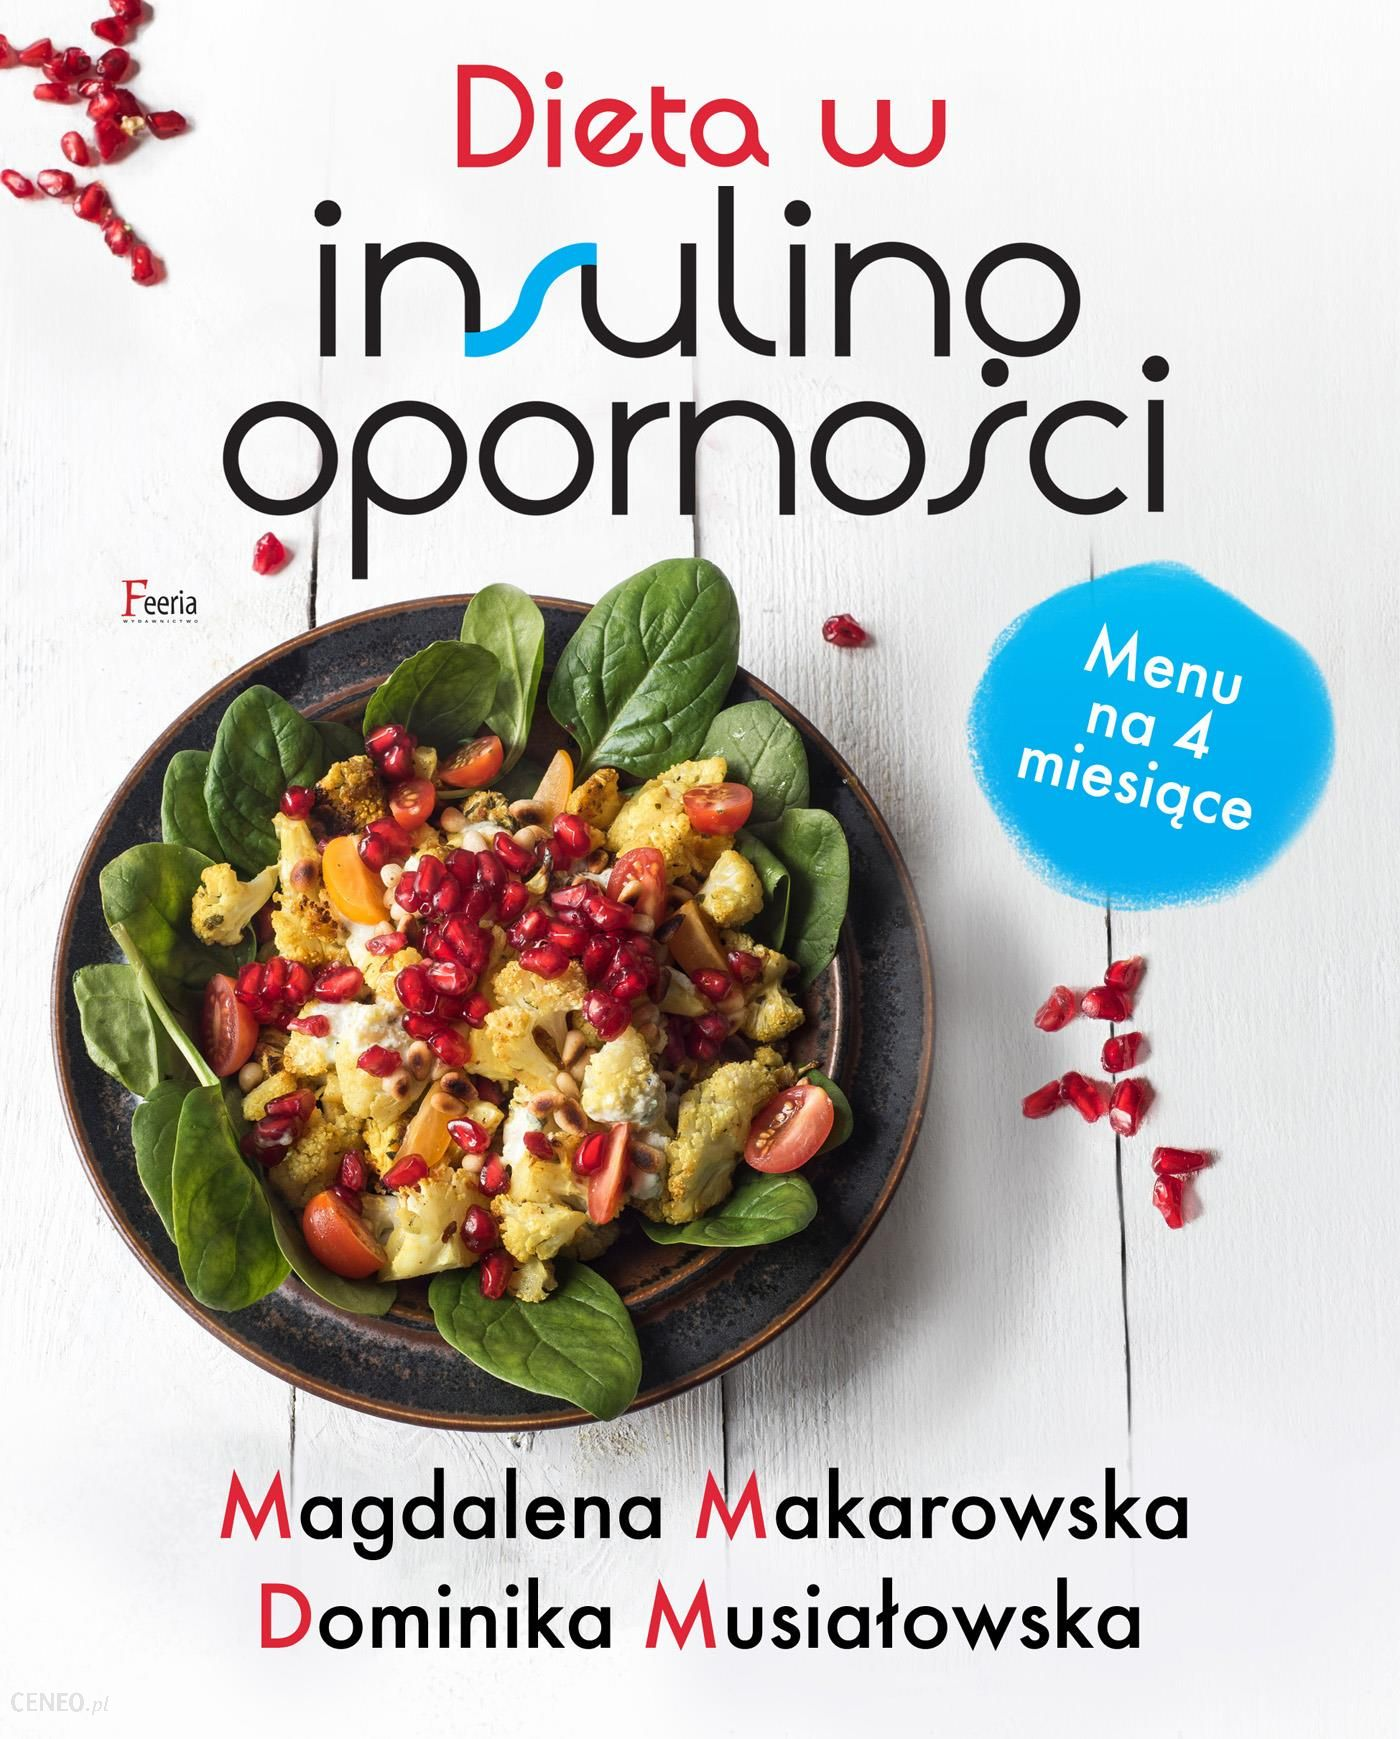 Dieta W Insulinoopornosci